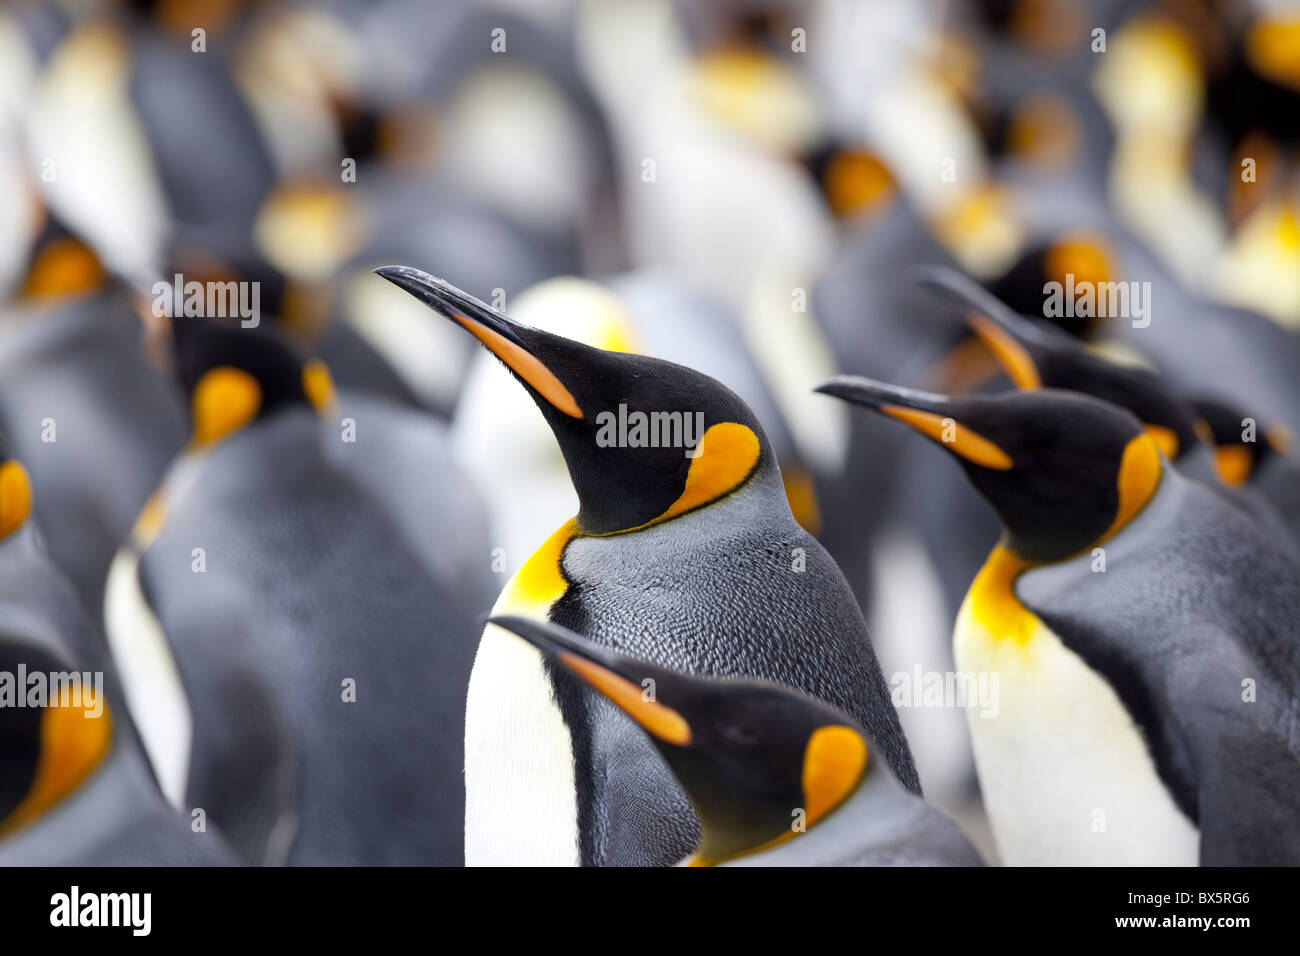 King penguin colony (Aptenodytes patagonicus), Gold Harbour, South Georgia, Antarctic, Polar Regions - Stock Image